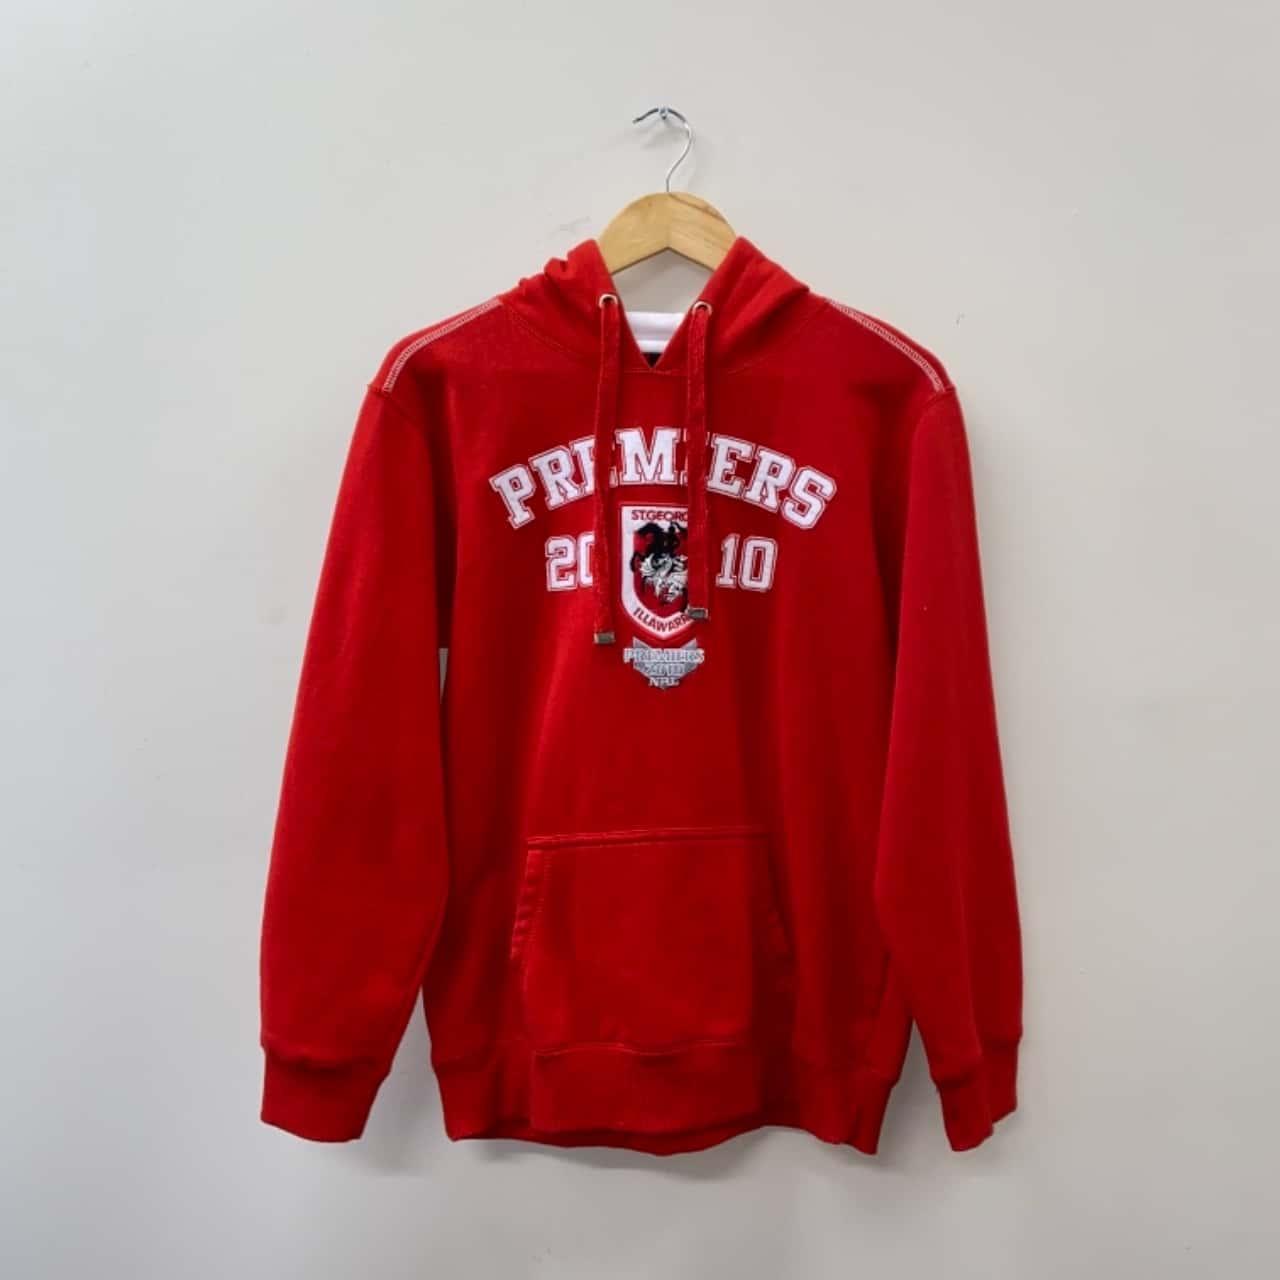 ** REDUCED LAST CHANCE ** Team NRL Boys Size 14y Red St. George Illawarra Dragons 2010 Premiers Hoodie